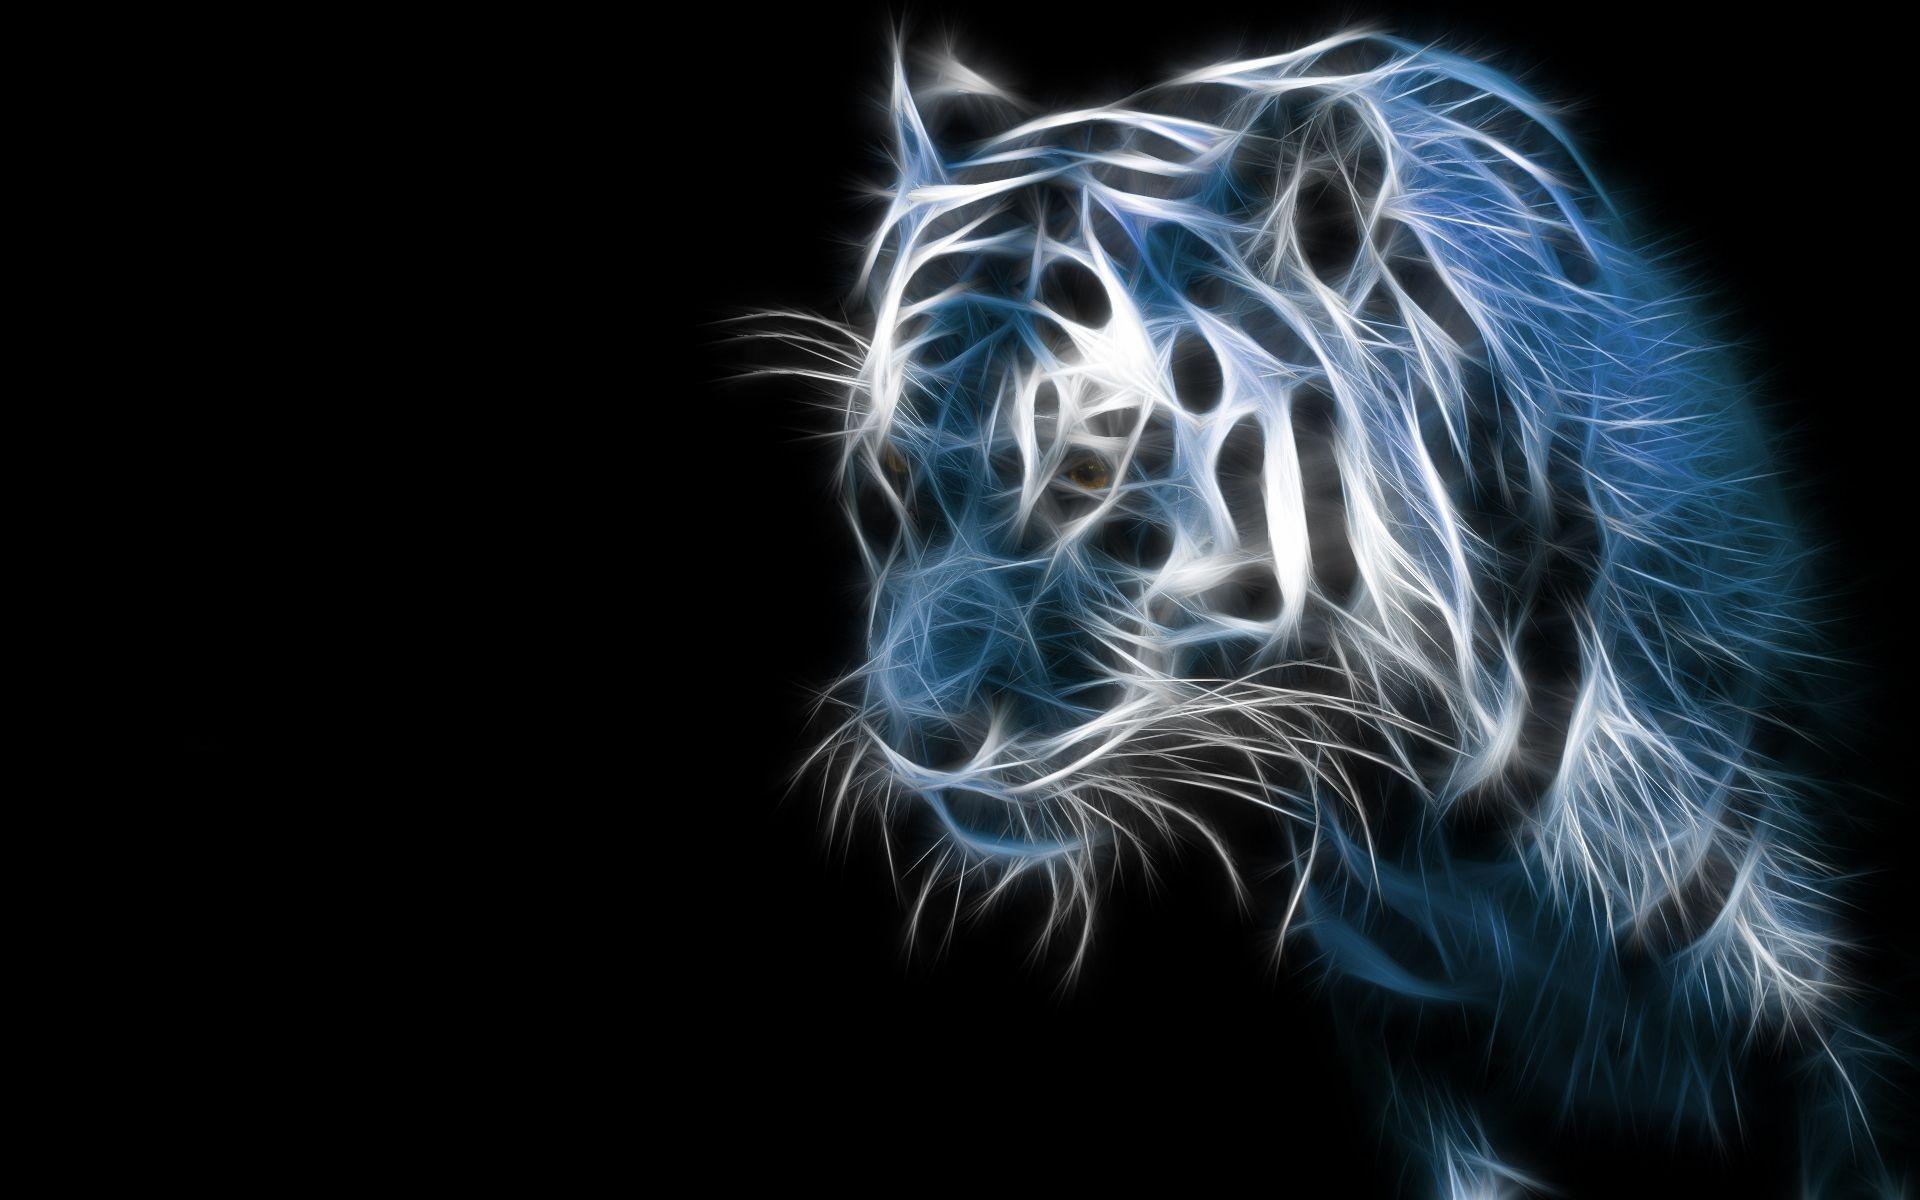 Best 3d Wallpaper In The World Hd Wallpapers For Laptop Cool Desktop Backgrounds Tiger Wallpaper